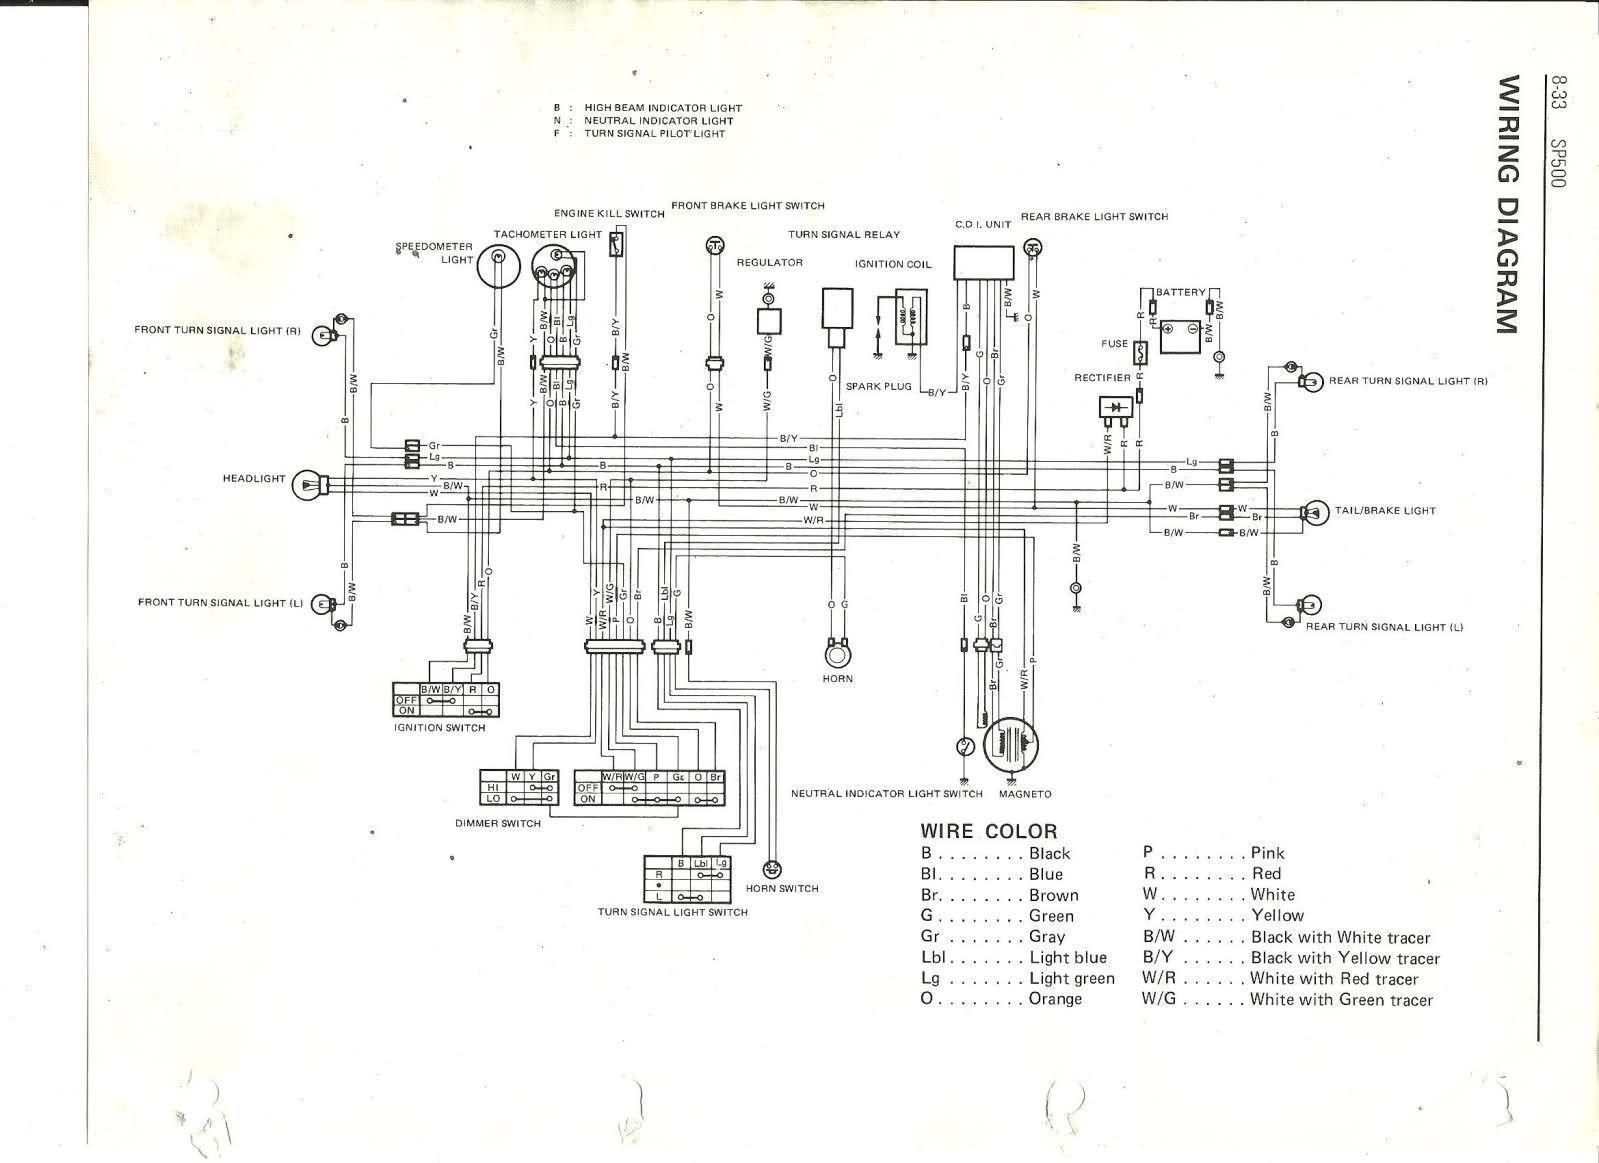 Suzuki Dr 600 Wiring Diagram - Electrical Work Wiring Diagram •